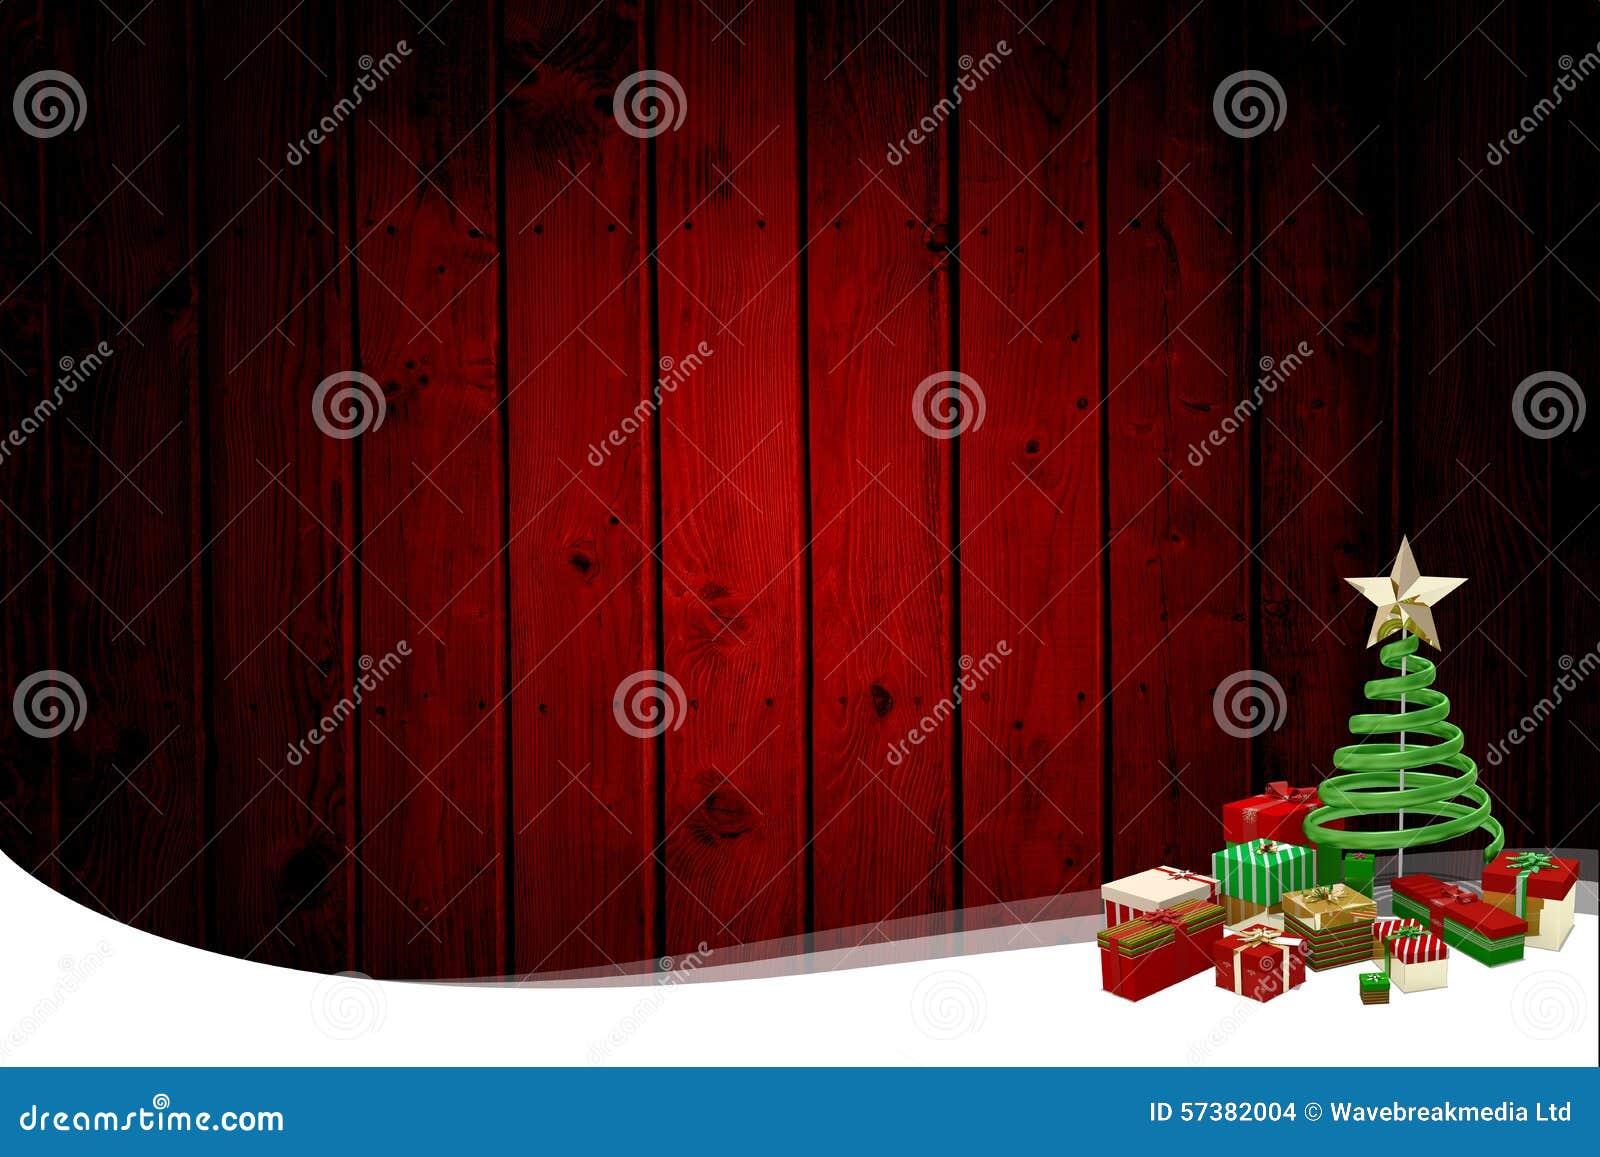 Kerstmis als thema gehad kader met boom